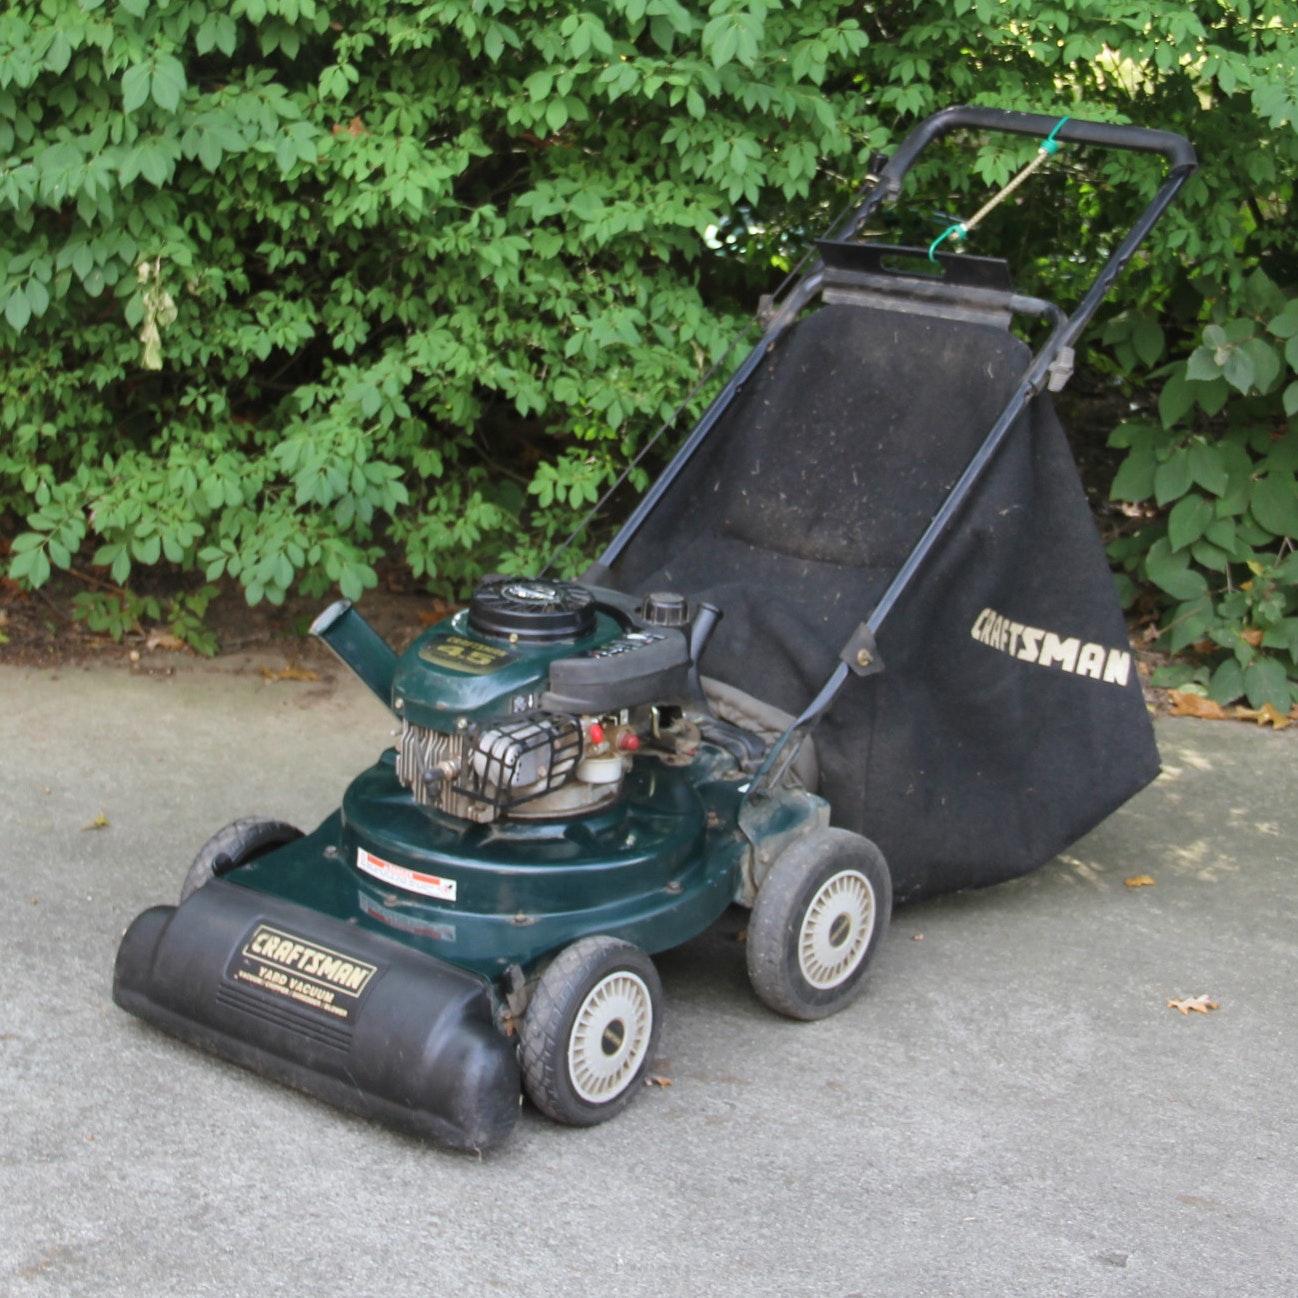 Craftsman 4.5 Horse Powered Lawn Vacuum